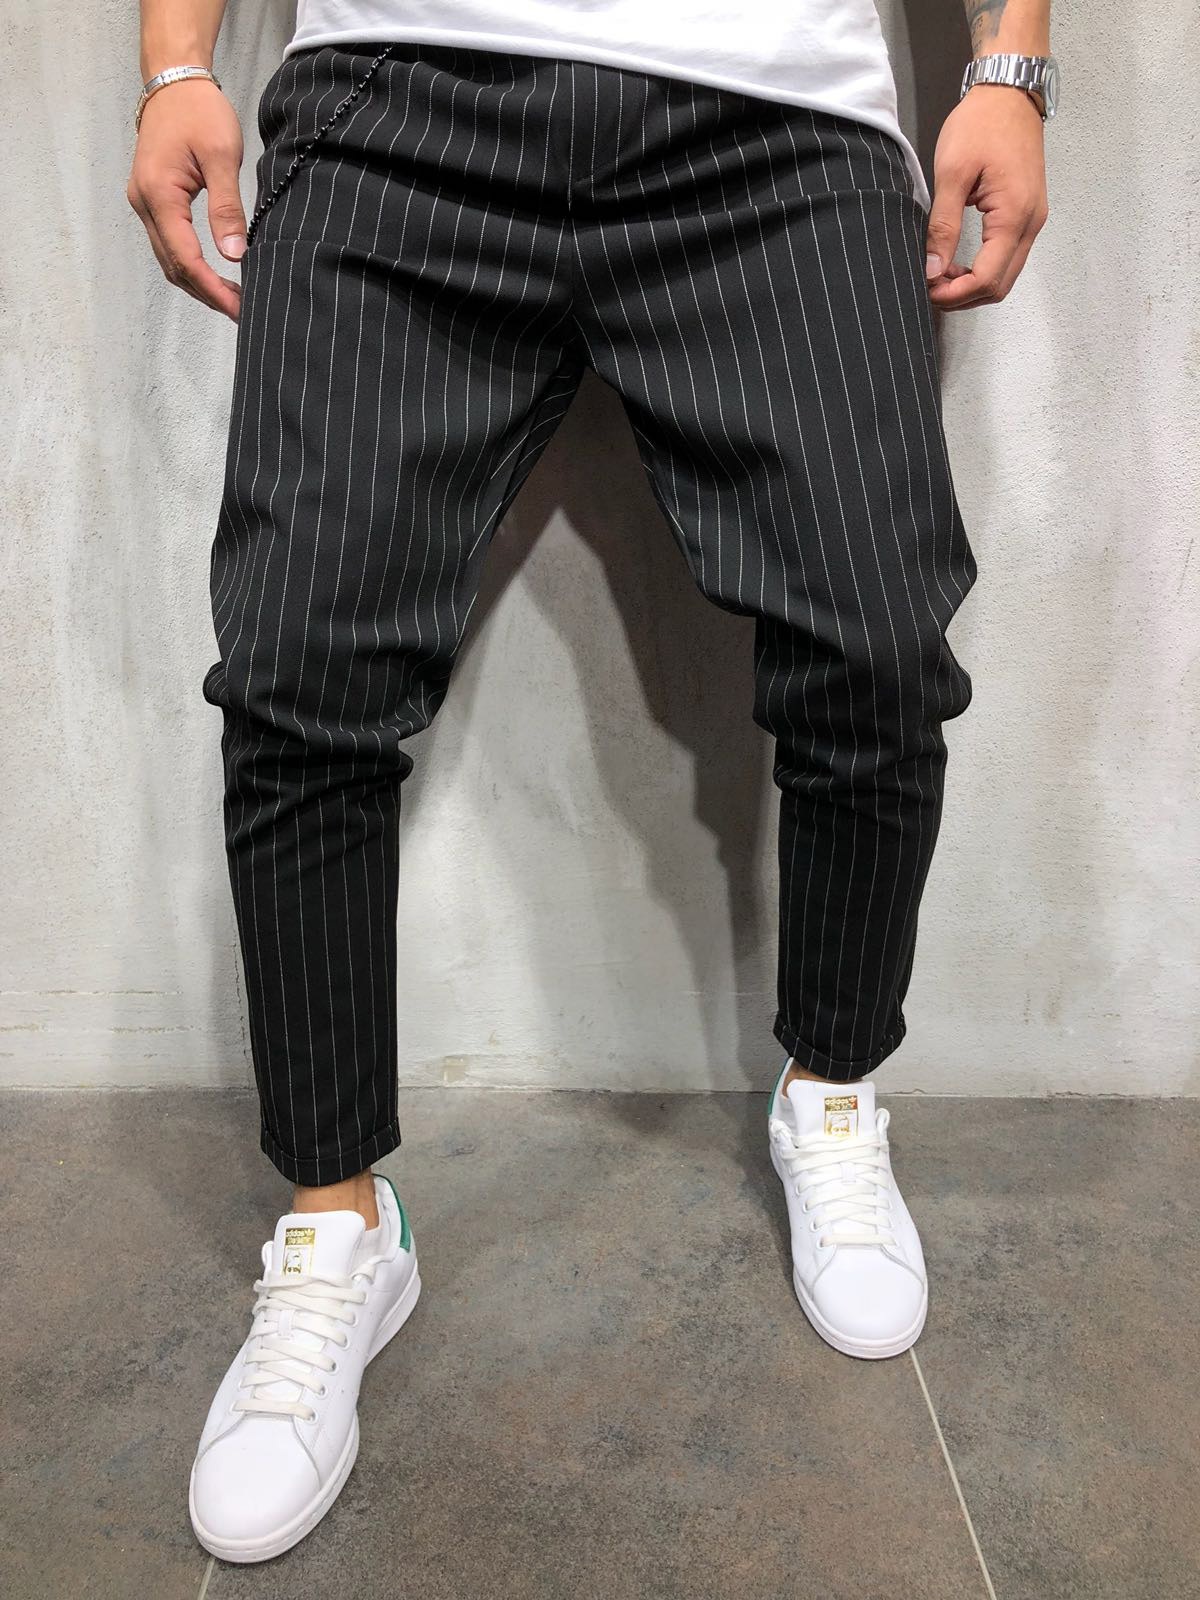 Ha2ab616d6a04444e8ea1d12c9fbec54fJ Spring Autumn Casual Men Sweat Pants Male Sportswear Casual Trousers Straight Pants Hip Hop High Street Trousers Pants Joggers